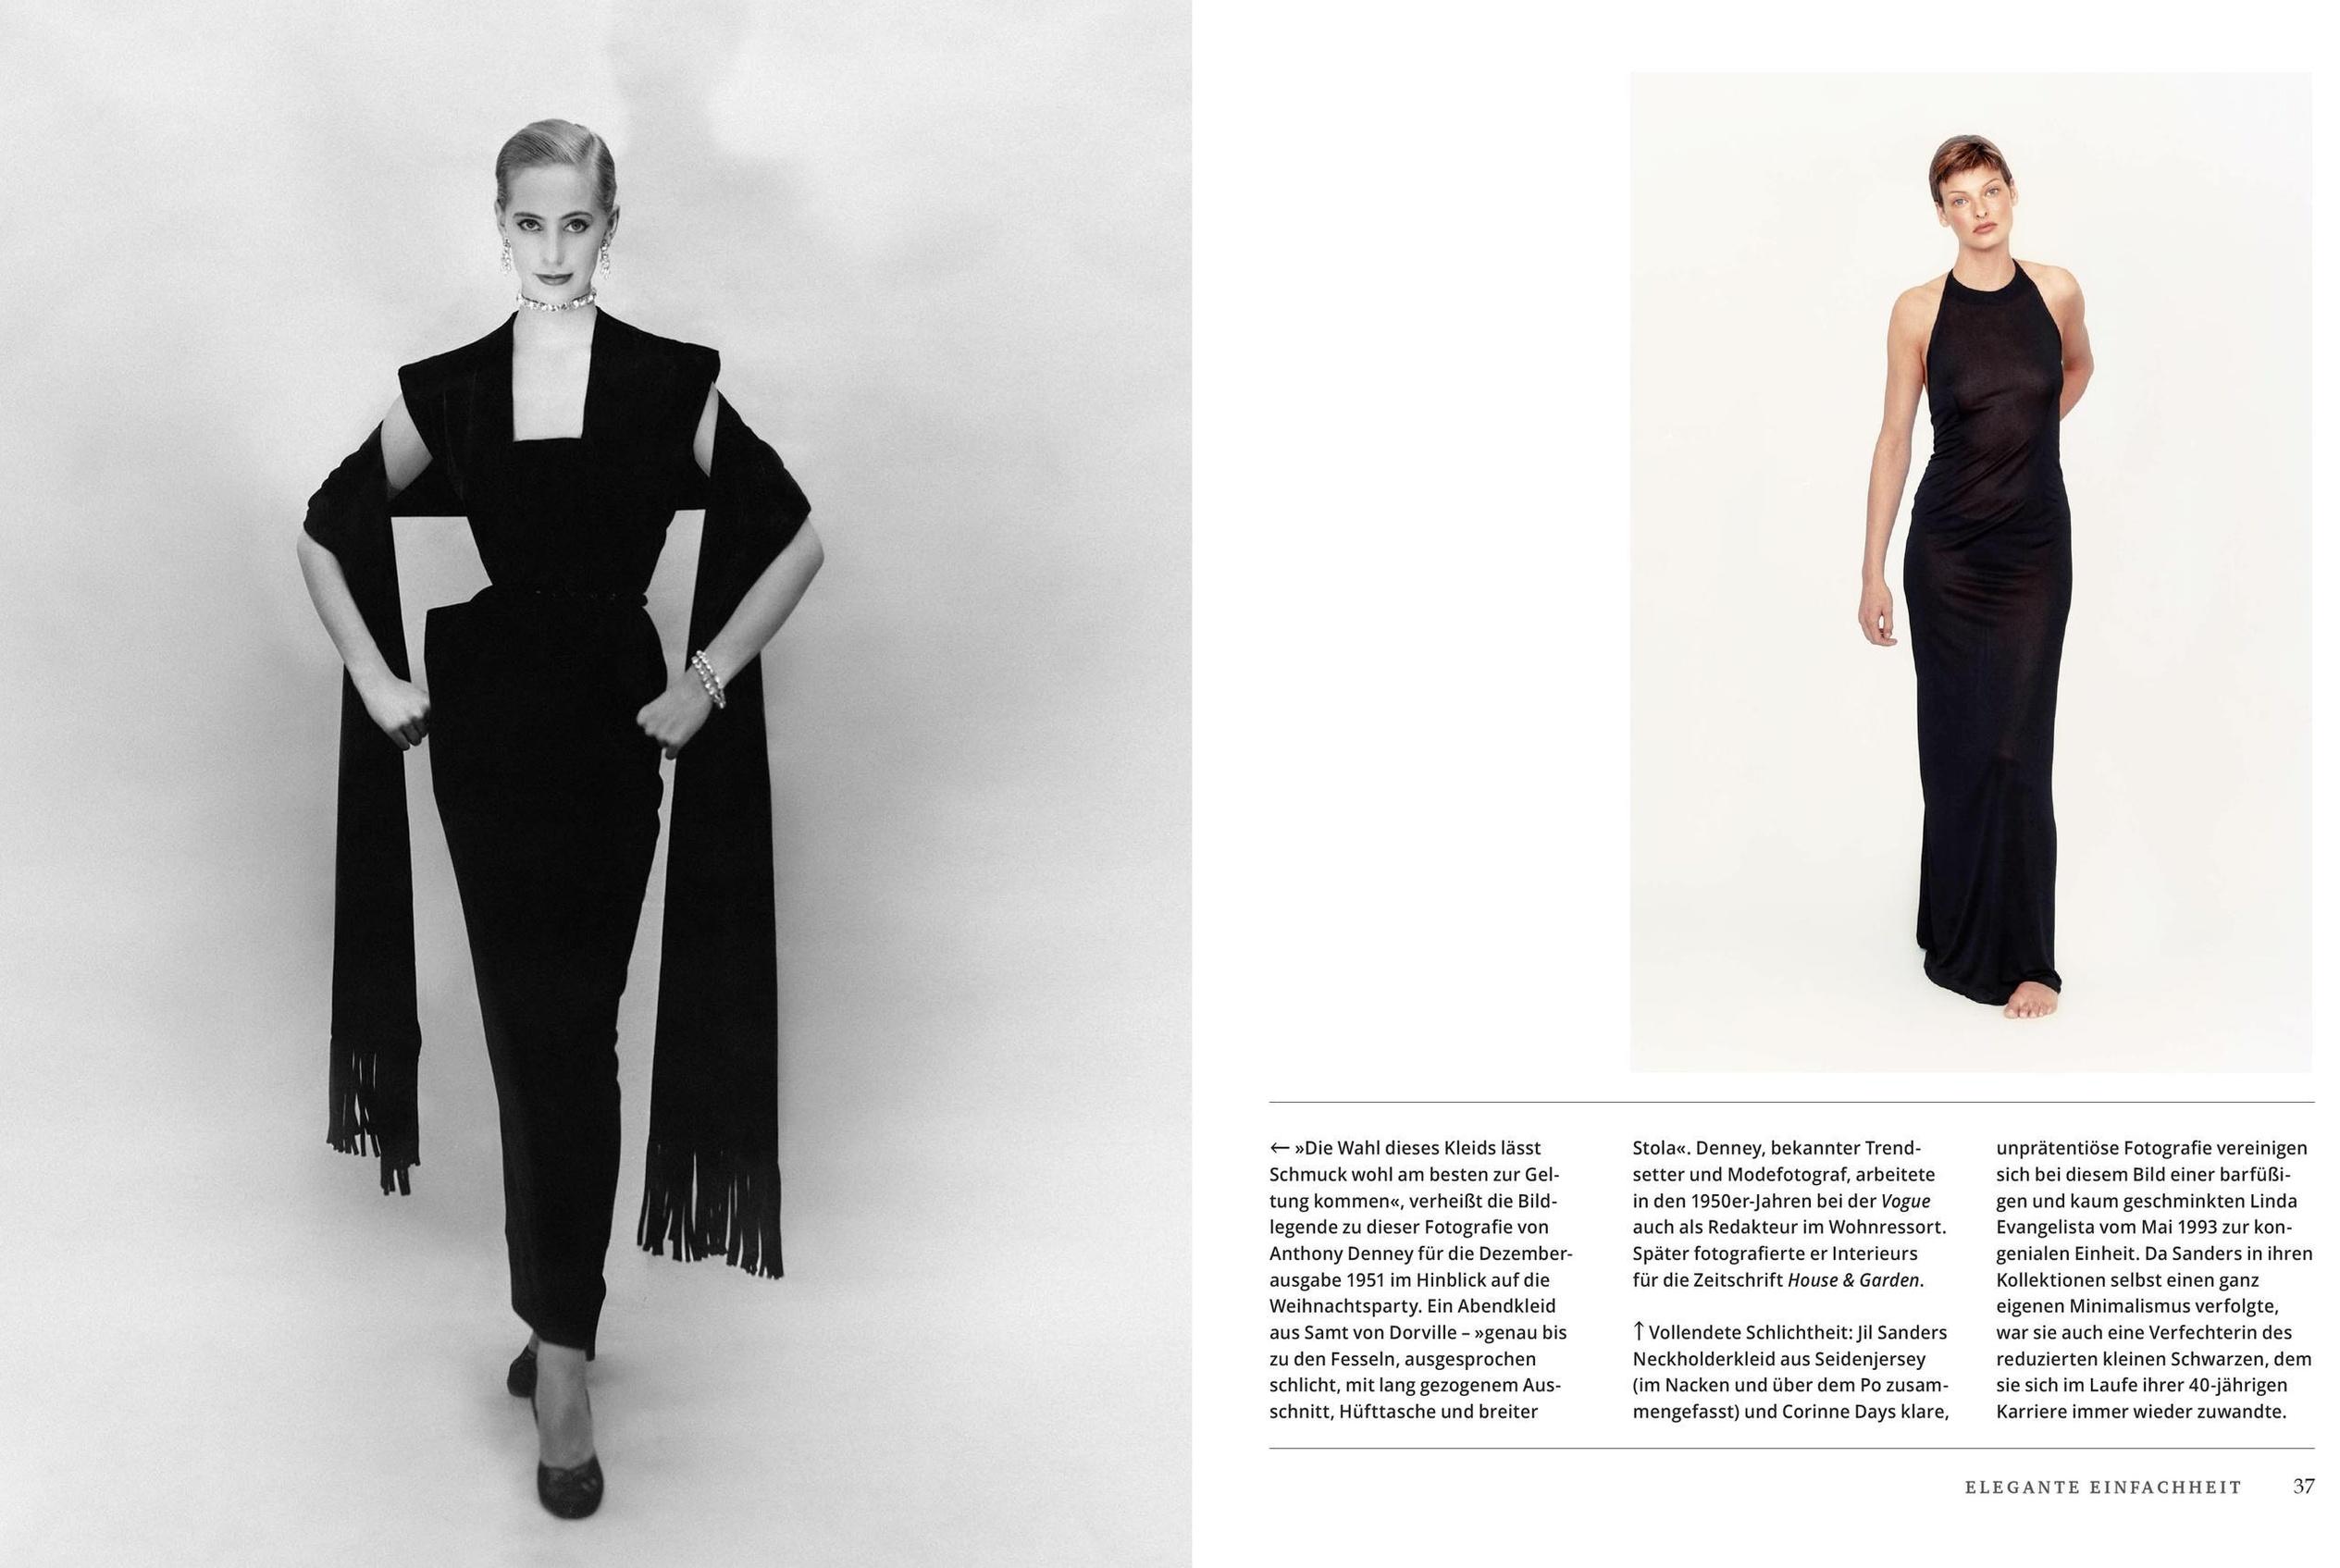 vogue: little black dress